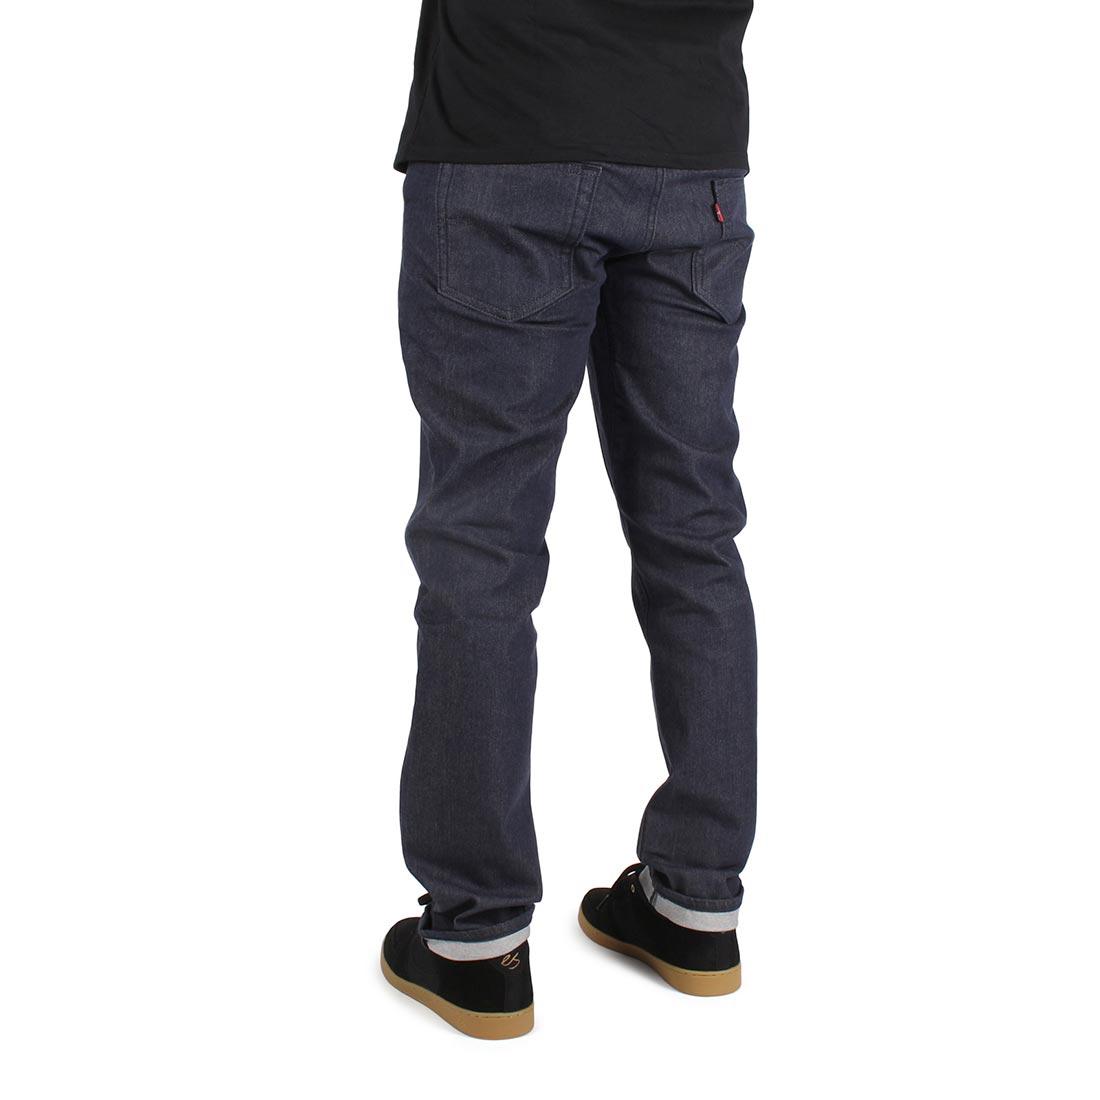 2f94150676a8 Levi's Commuter Pro 511 Slim Fit Jeans - Sta-Dark Indigo